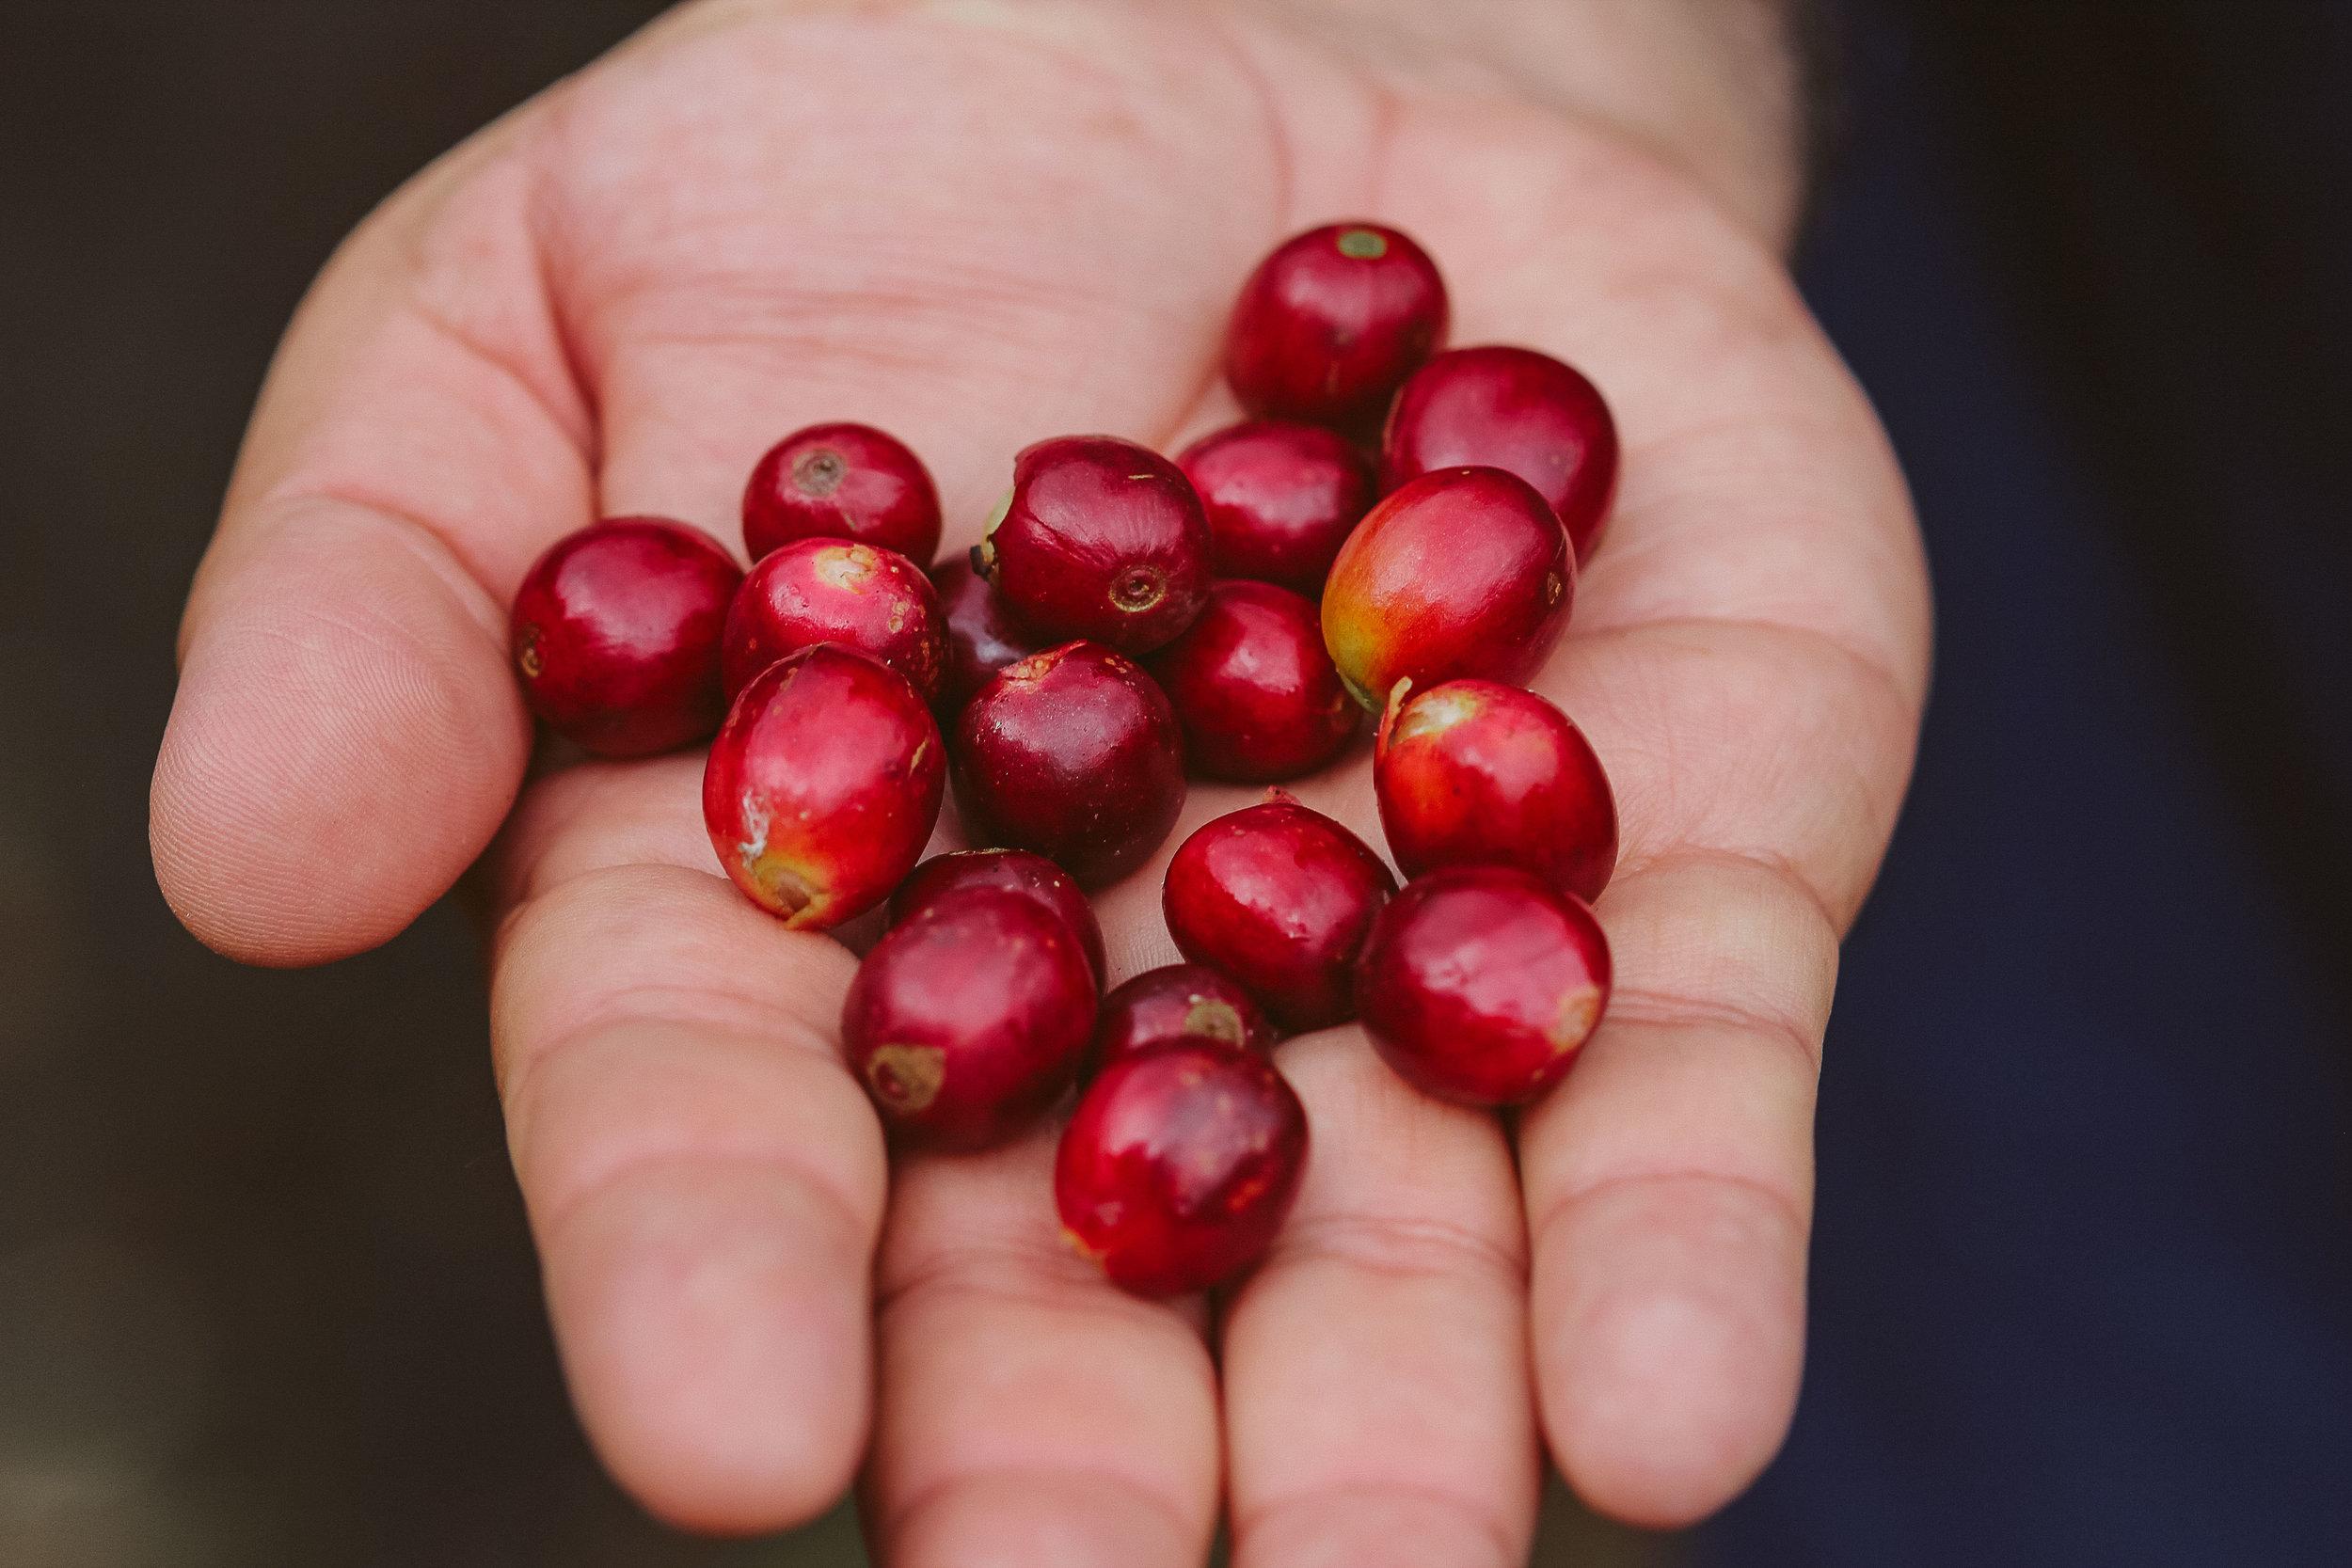 Organic coffee cherries from Finca La Hammonia